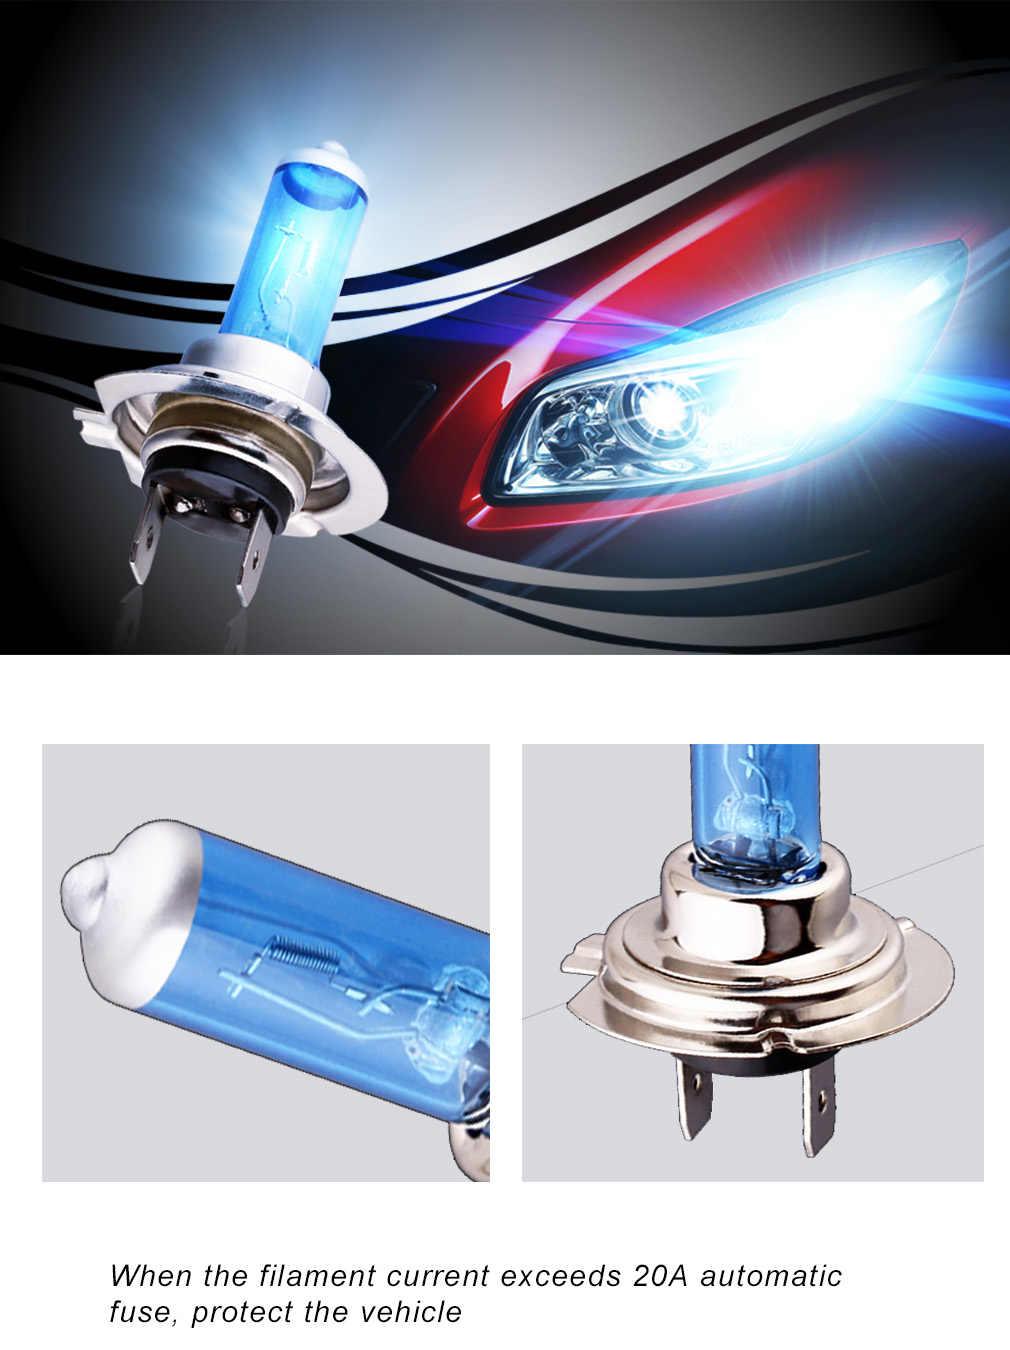 2PCS H4 H11 H7 55W 100W Halogen Headlight Bulb 12V H1 H3 9005 9006 9007 9004 HB3 HB4 HB5 Auto Fog Light White Car Lamp DRL